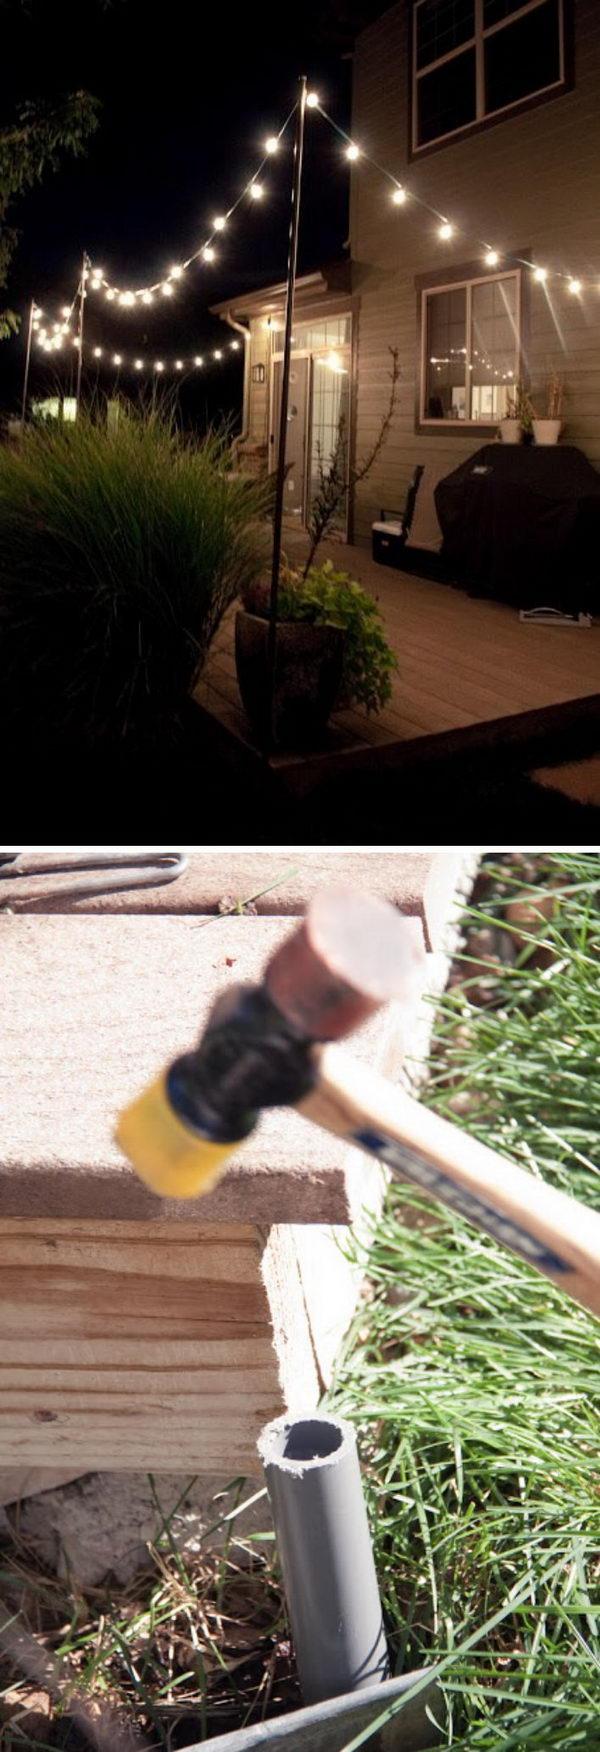 20 Amazing Outdoor Lighting Ideas for Your Backyard - Hative